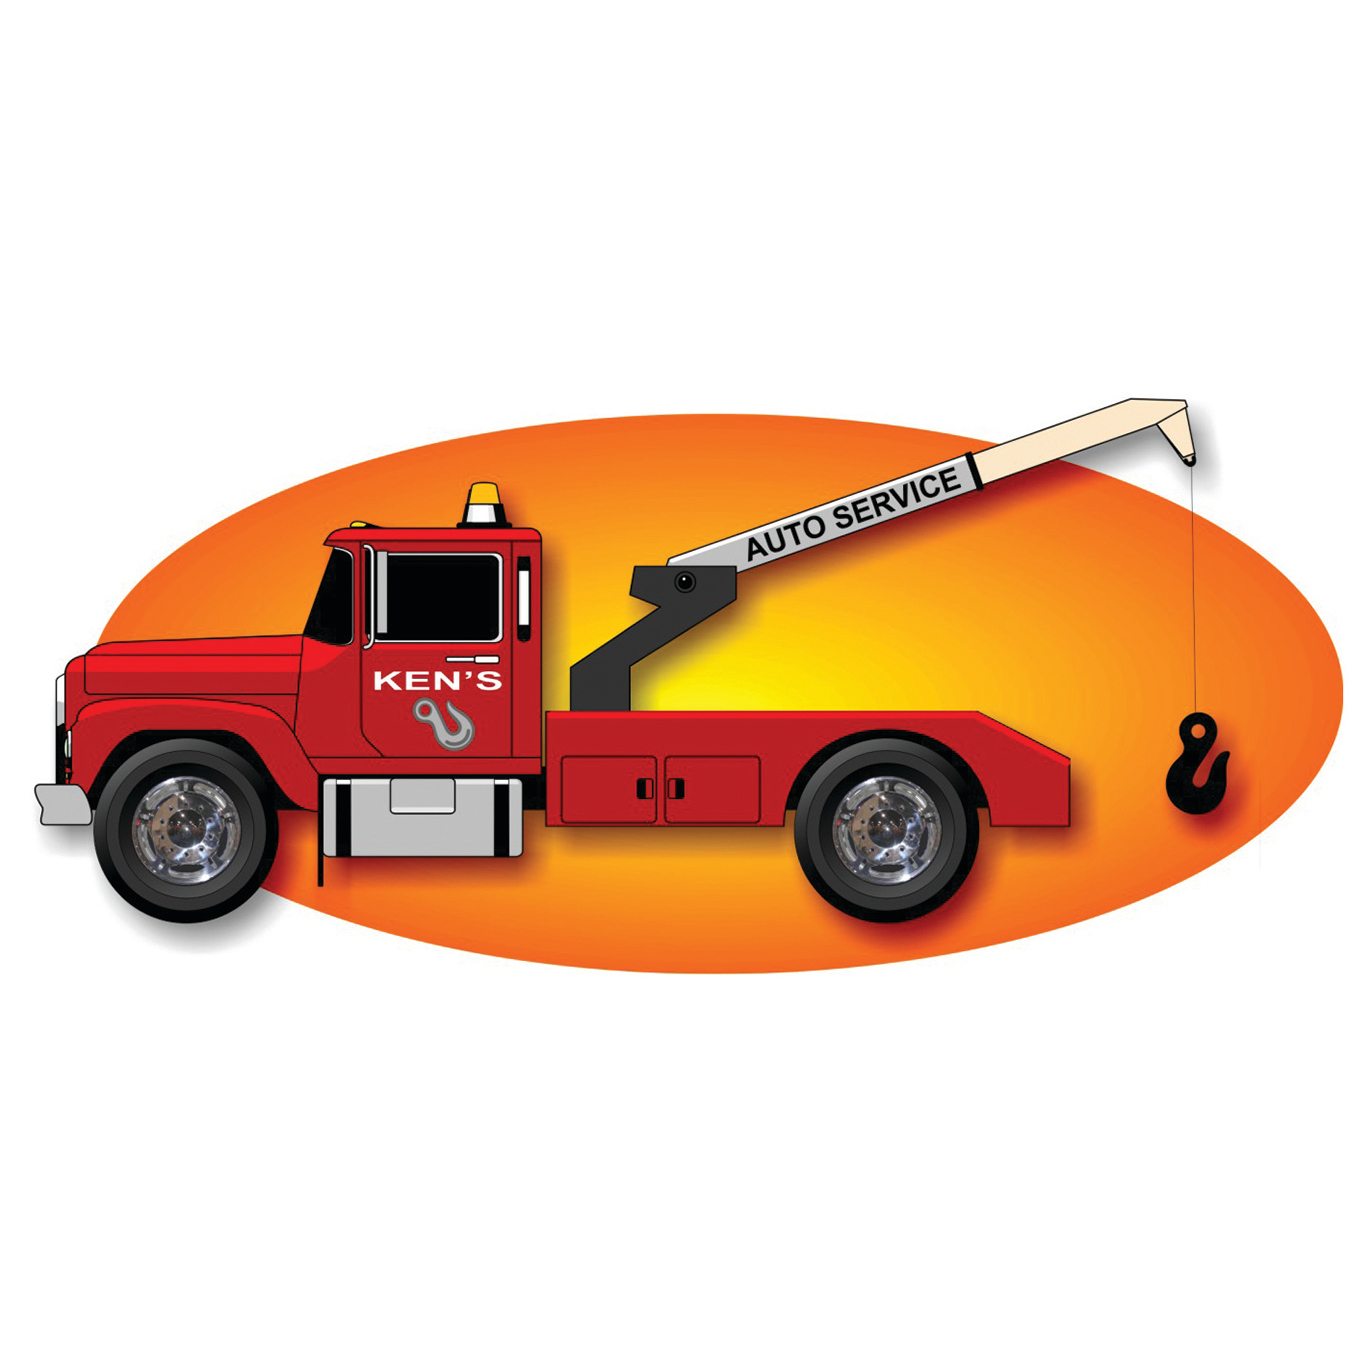 Ken's Auto Service, Inc. - Aurora, CO 80012 - (303)743-9800 | ShowMeLocal.com